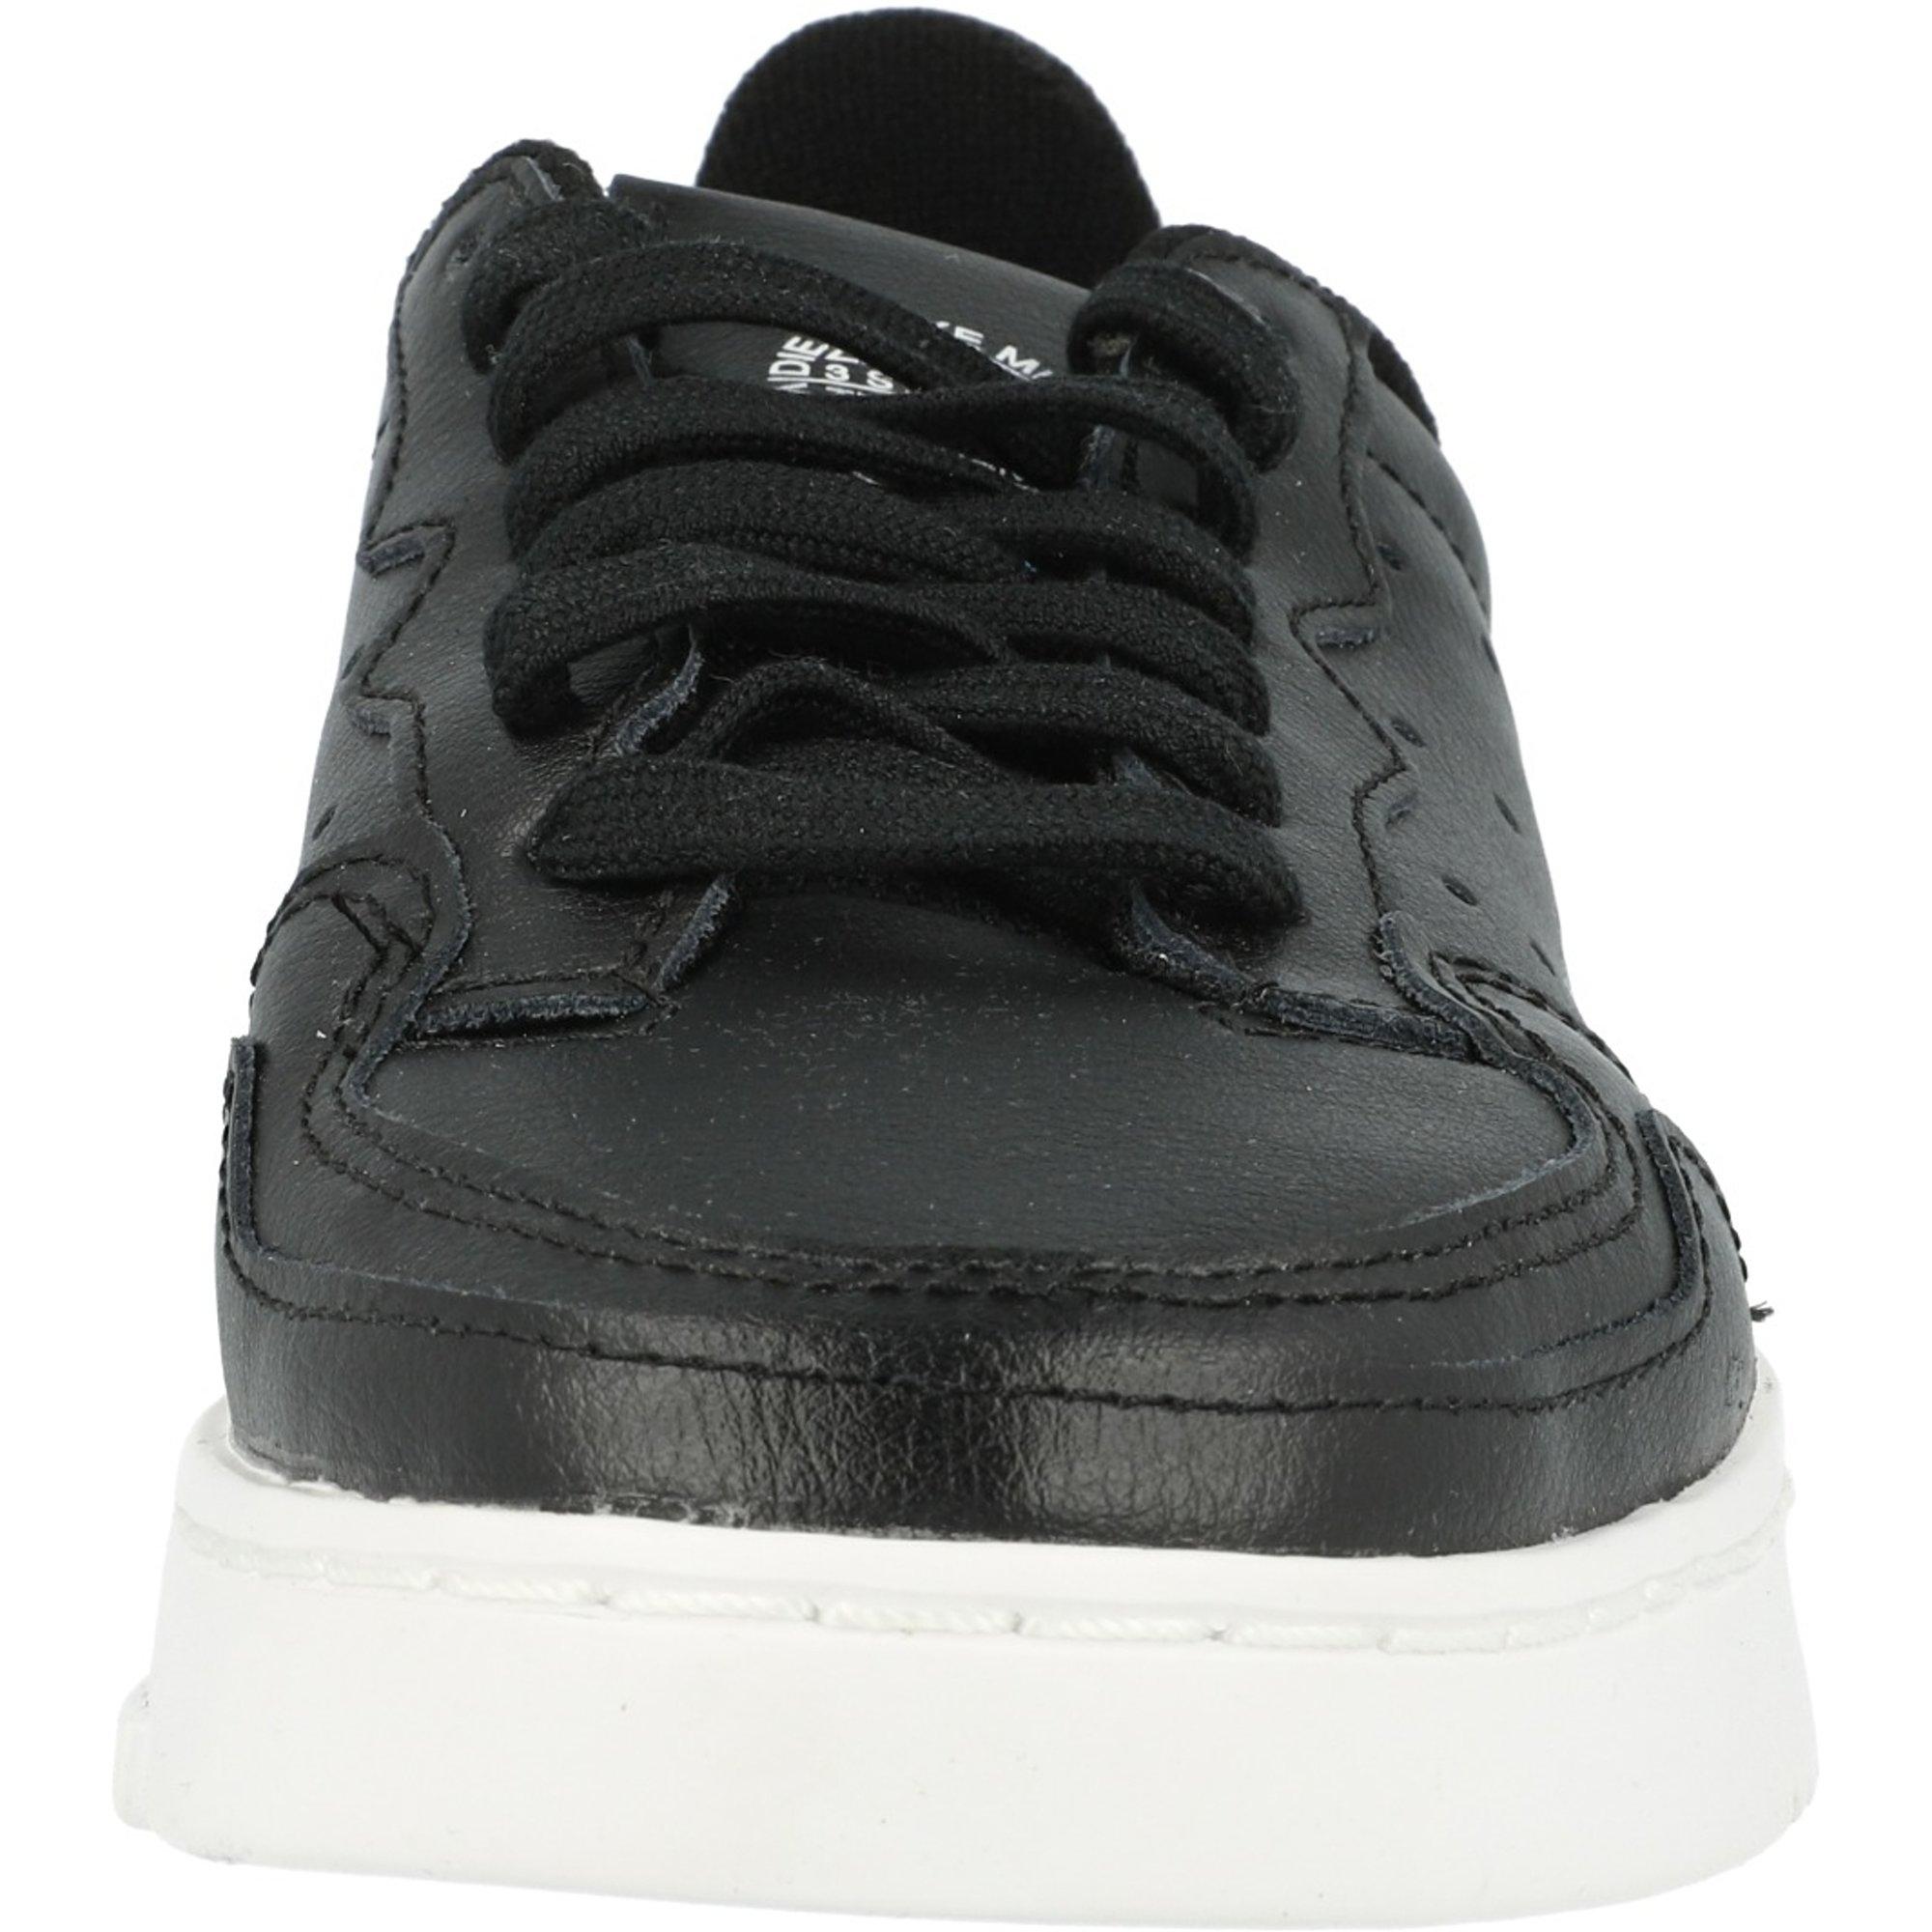 adidas Originals Supercourt J Black/White Leather